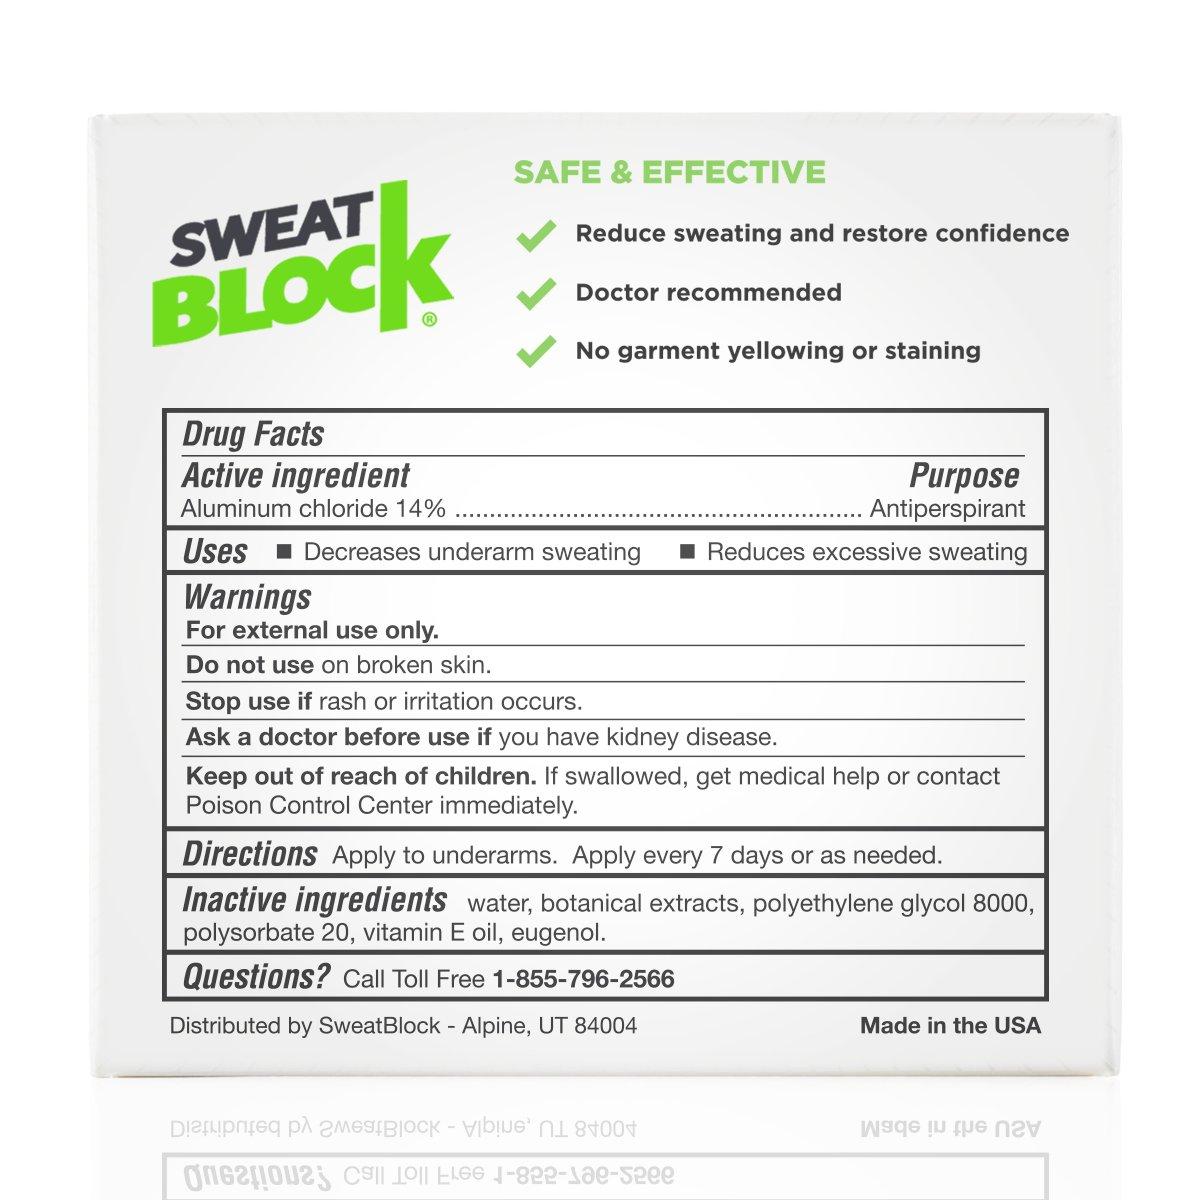 SweatBlock Antiperspirant - Clinical Strength - Reduce Sweat up to 7-days per Use by SweatBlock (Image #2)